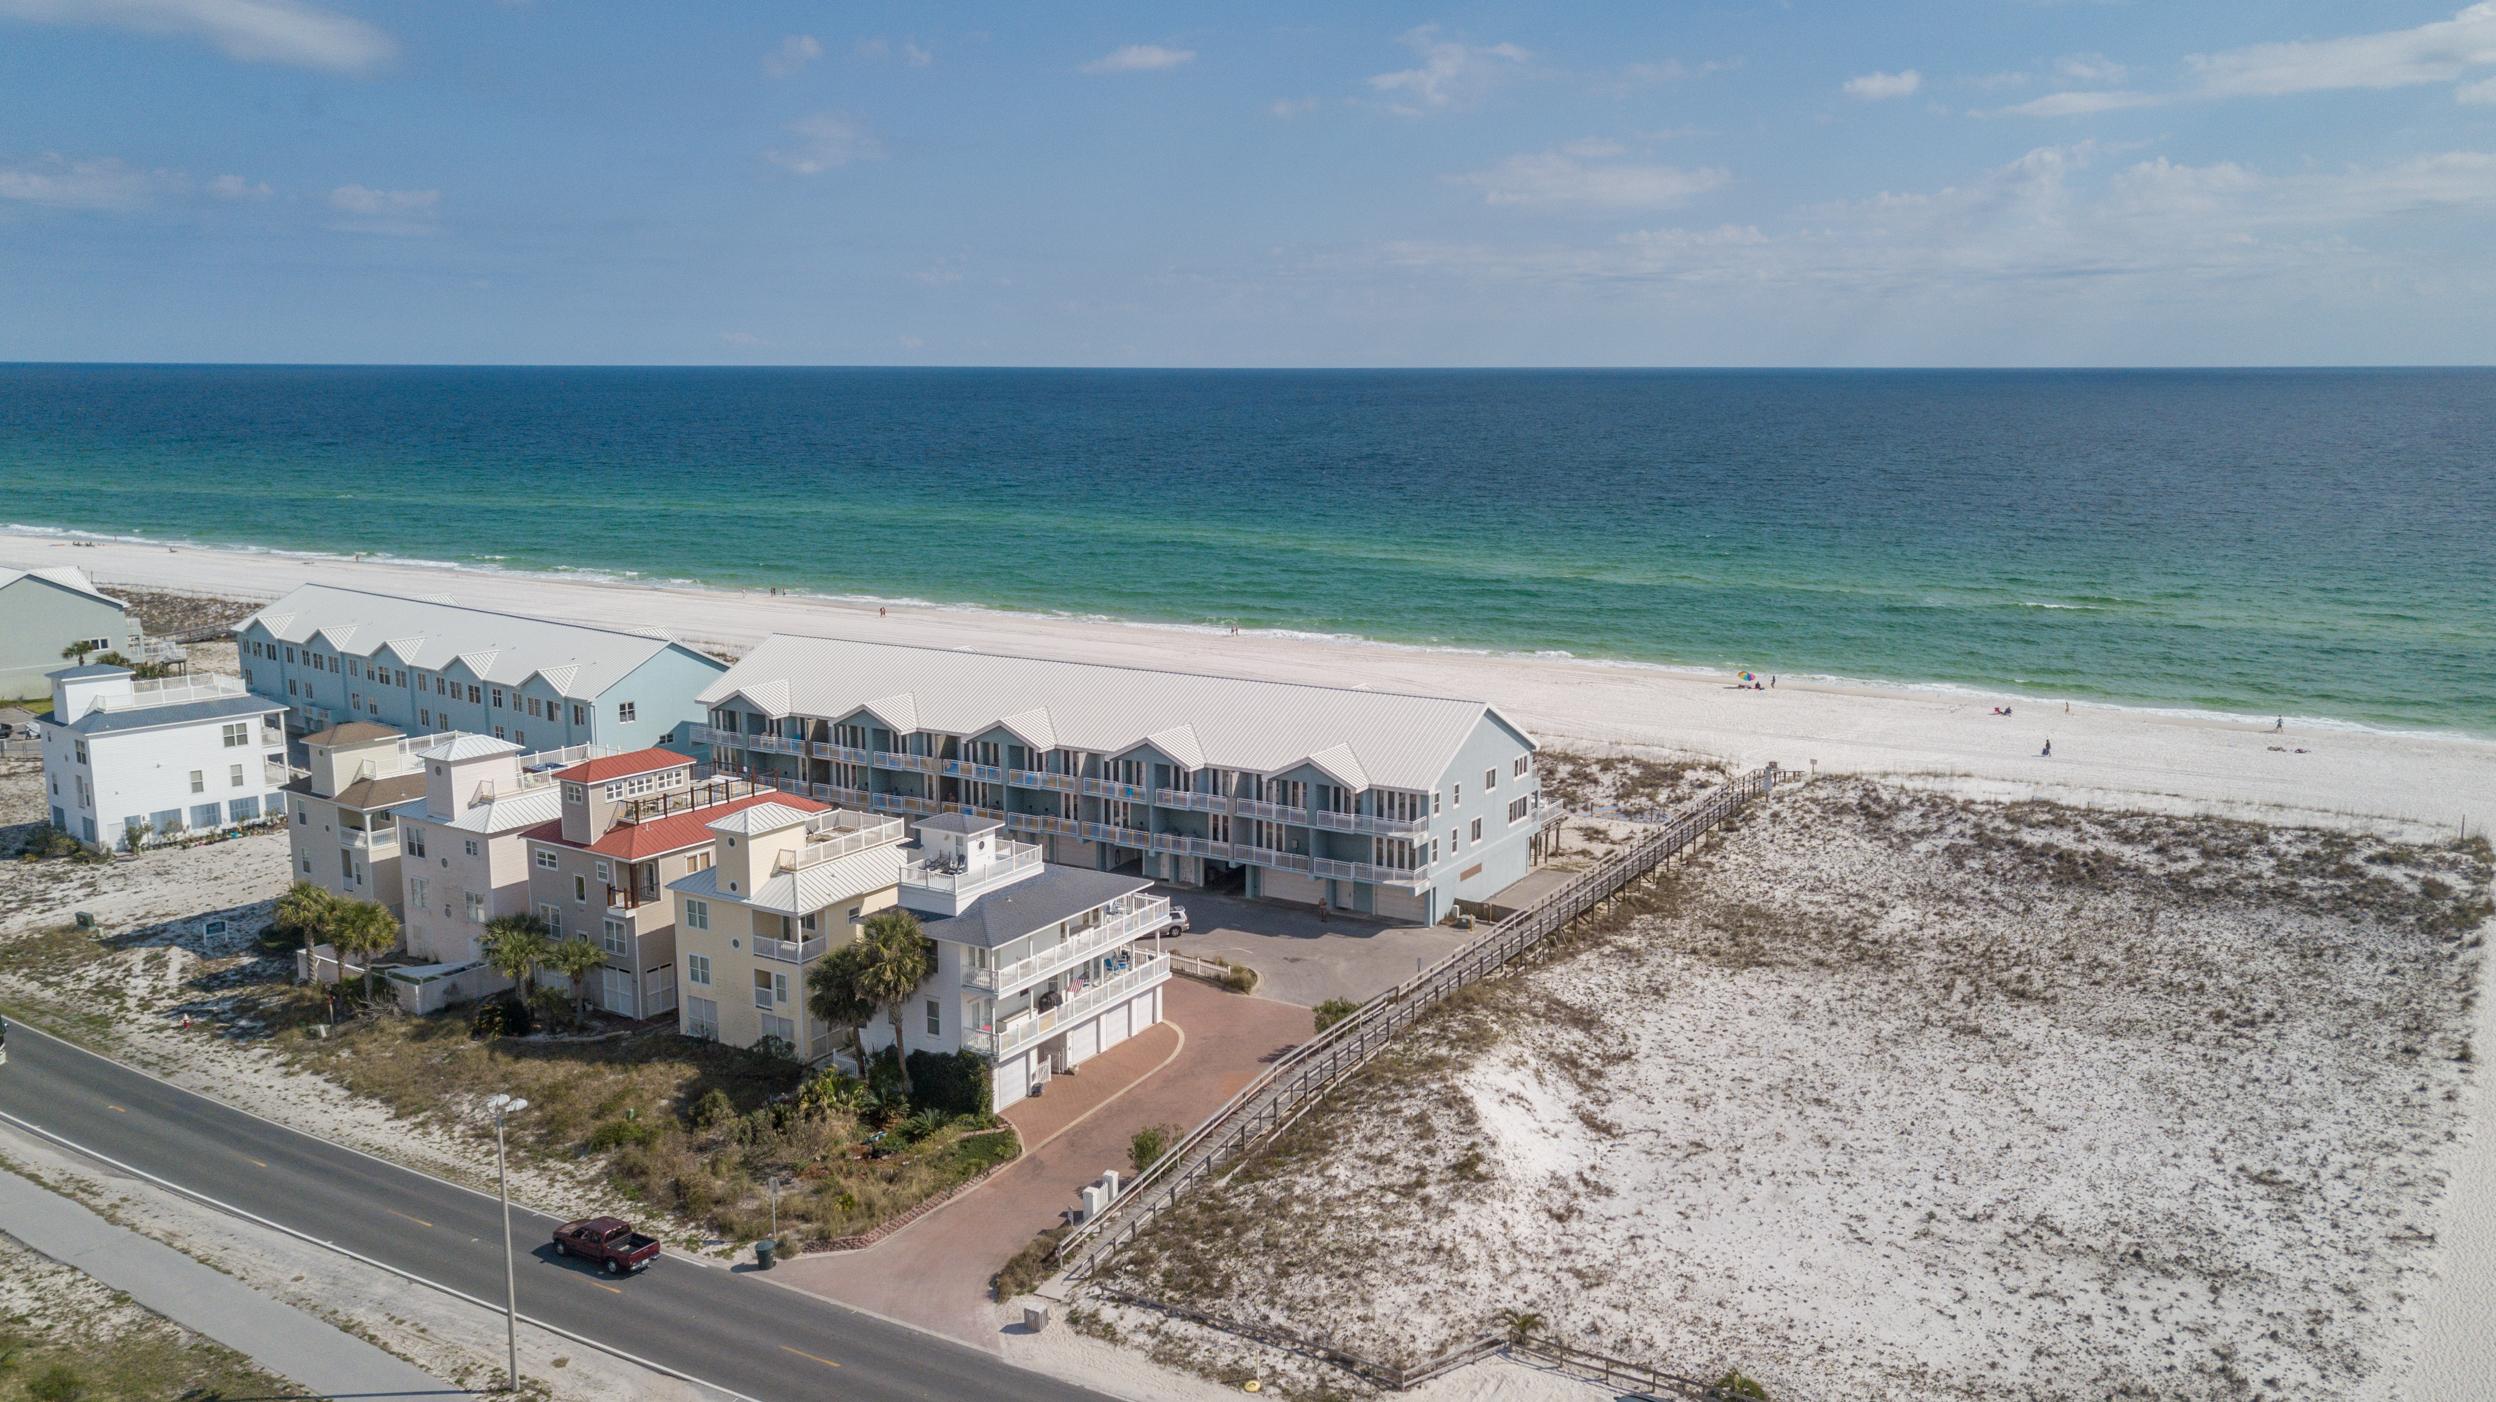 White Sands Cottage 501 Life's a Beach House Townhouse rental in White Sands Pensacola Beach in Pensacola Beach Florida - #64